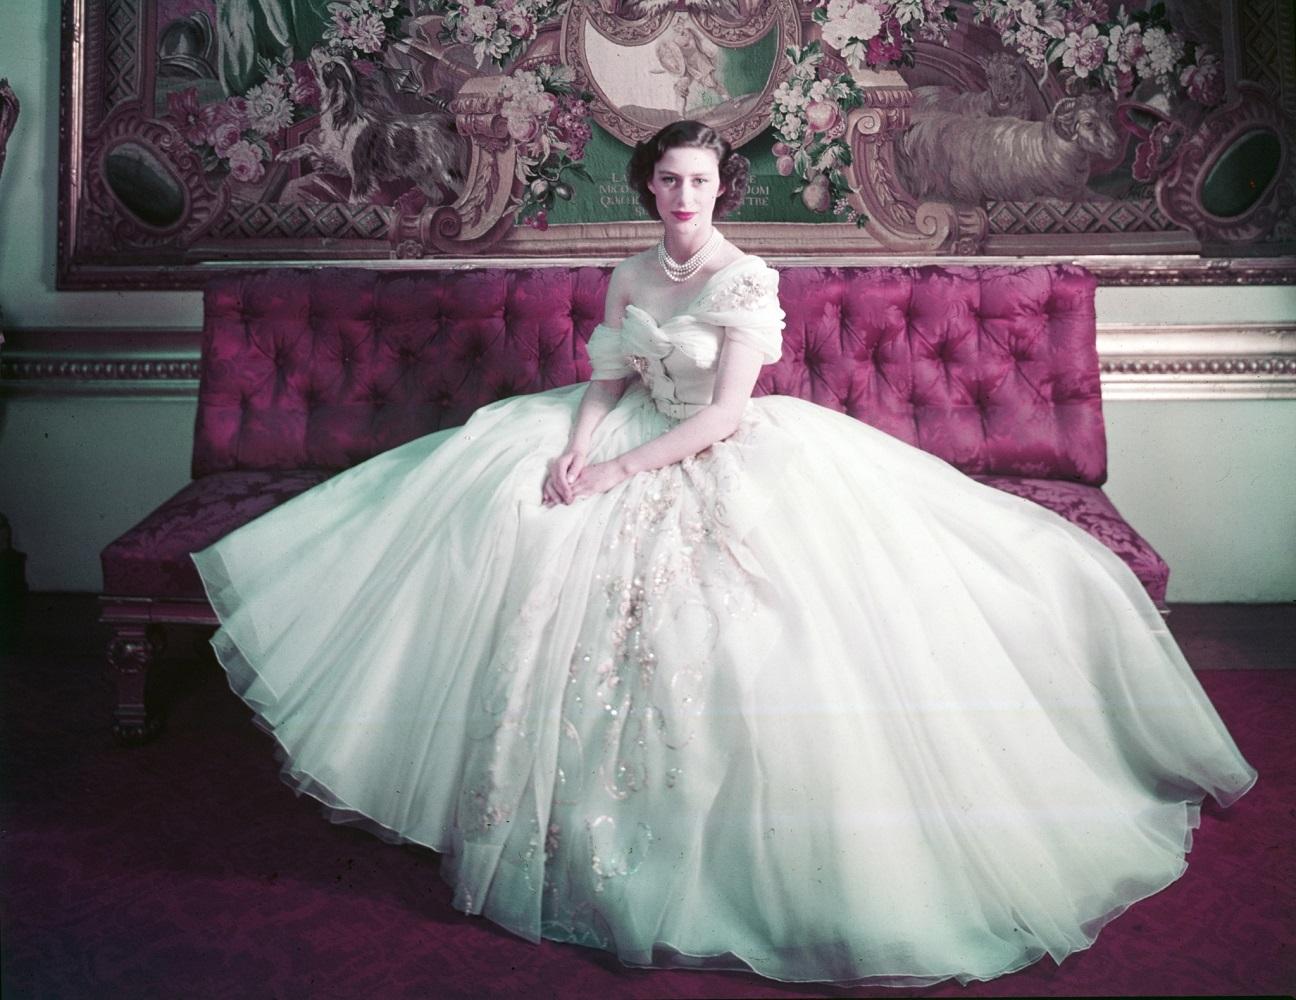 Prinses Margaret van Engeland (1930-2002) - foto Cecil Beaton (1904-80), Londen, GB, 1951.